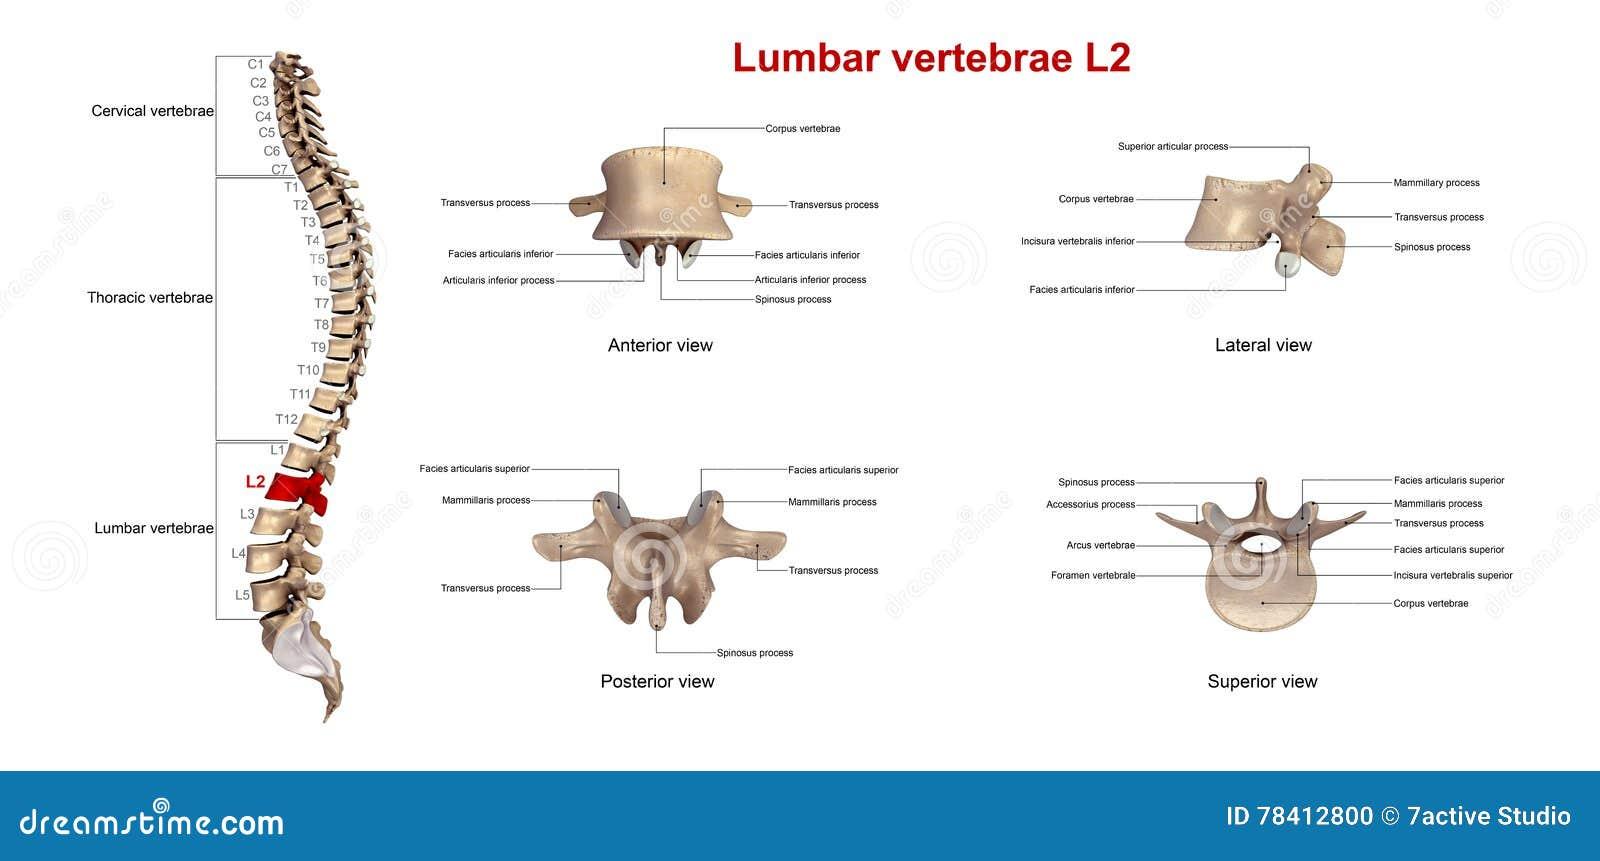 Lumbar vertebrae L2 stock illustration. Illustration of neck - 78412800